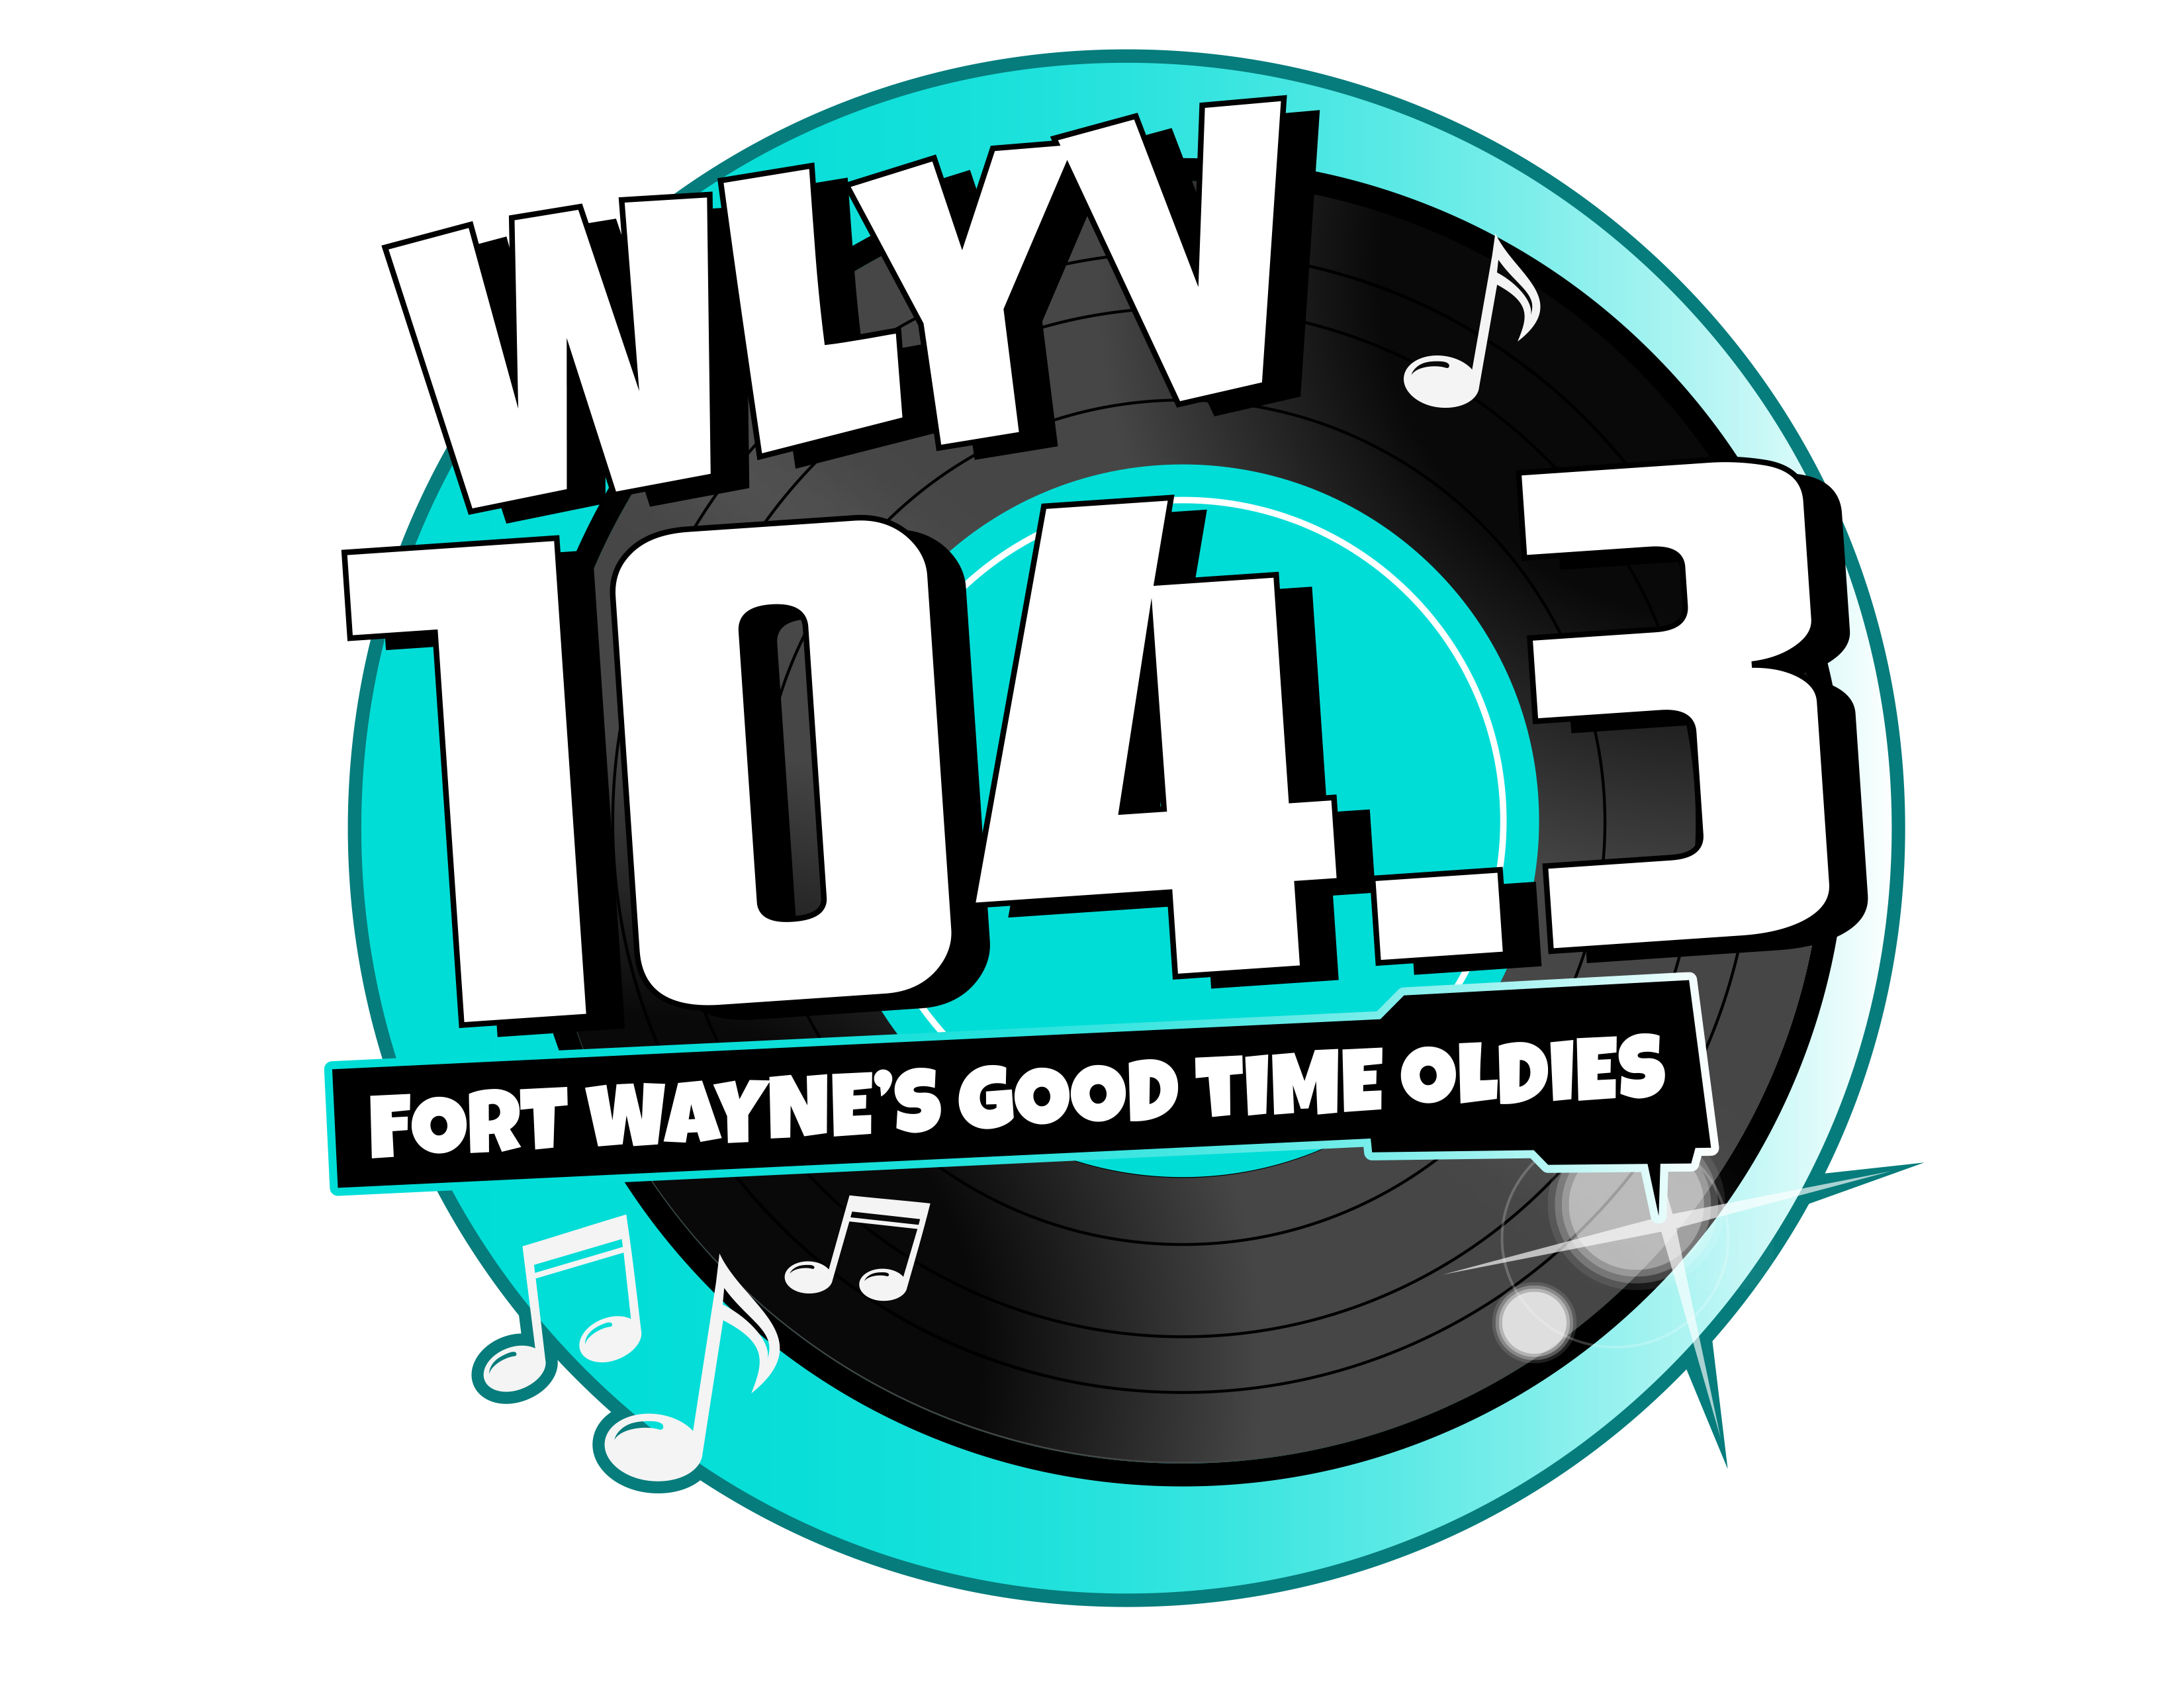 WLYV 1450 AM / 104.3FM